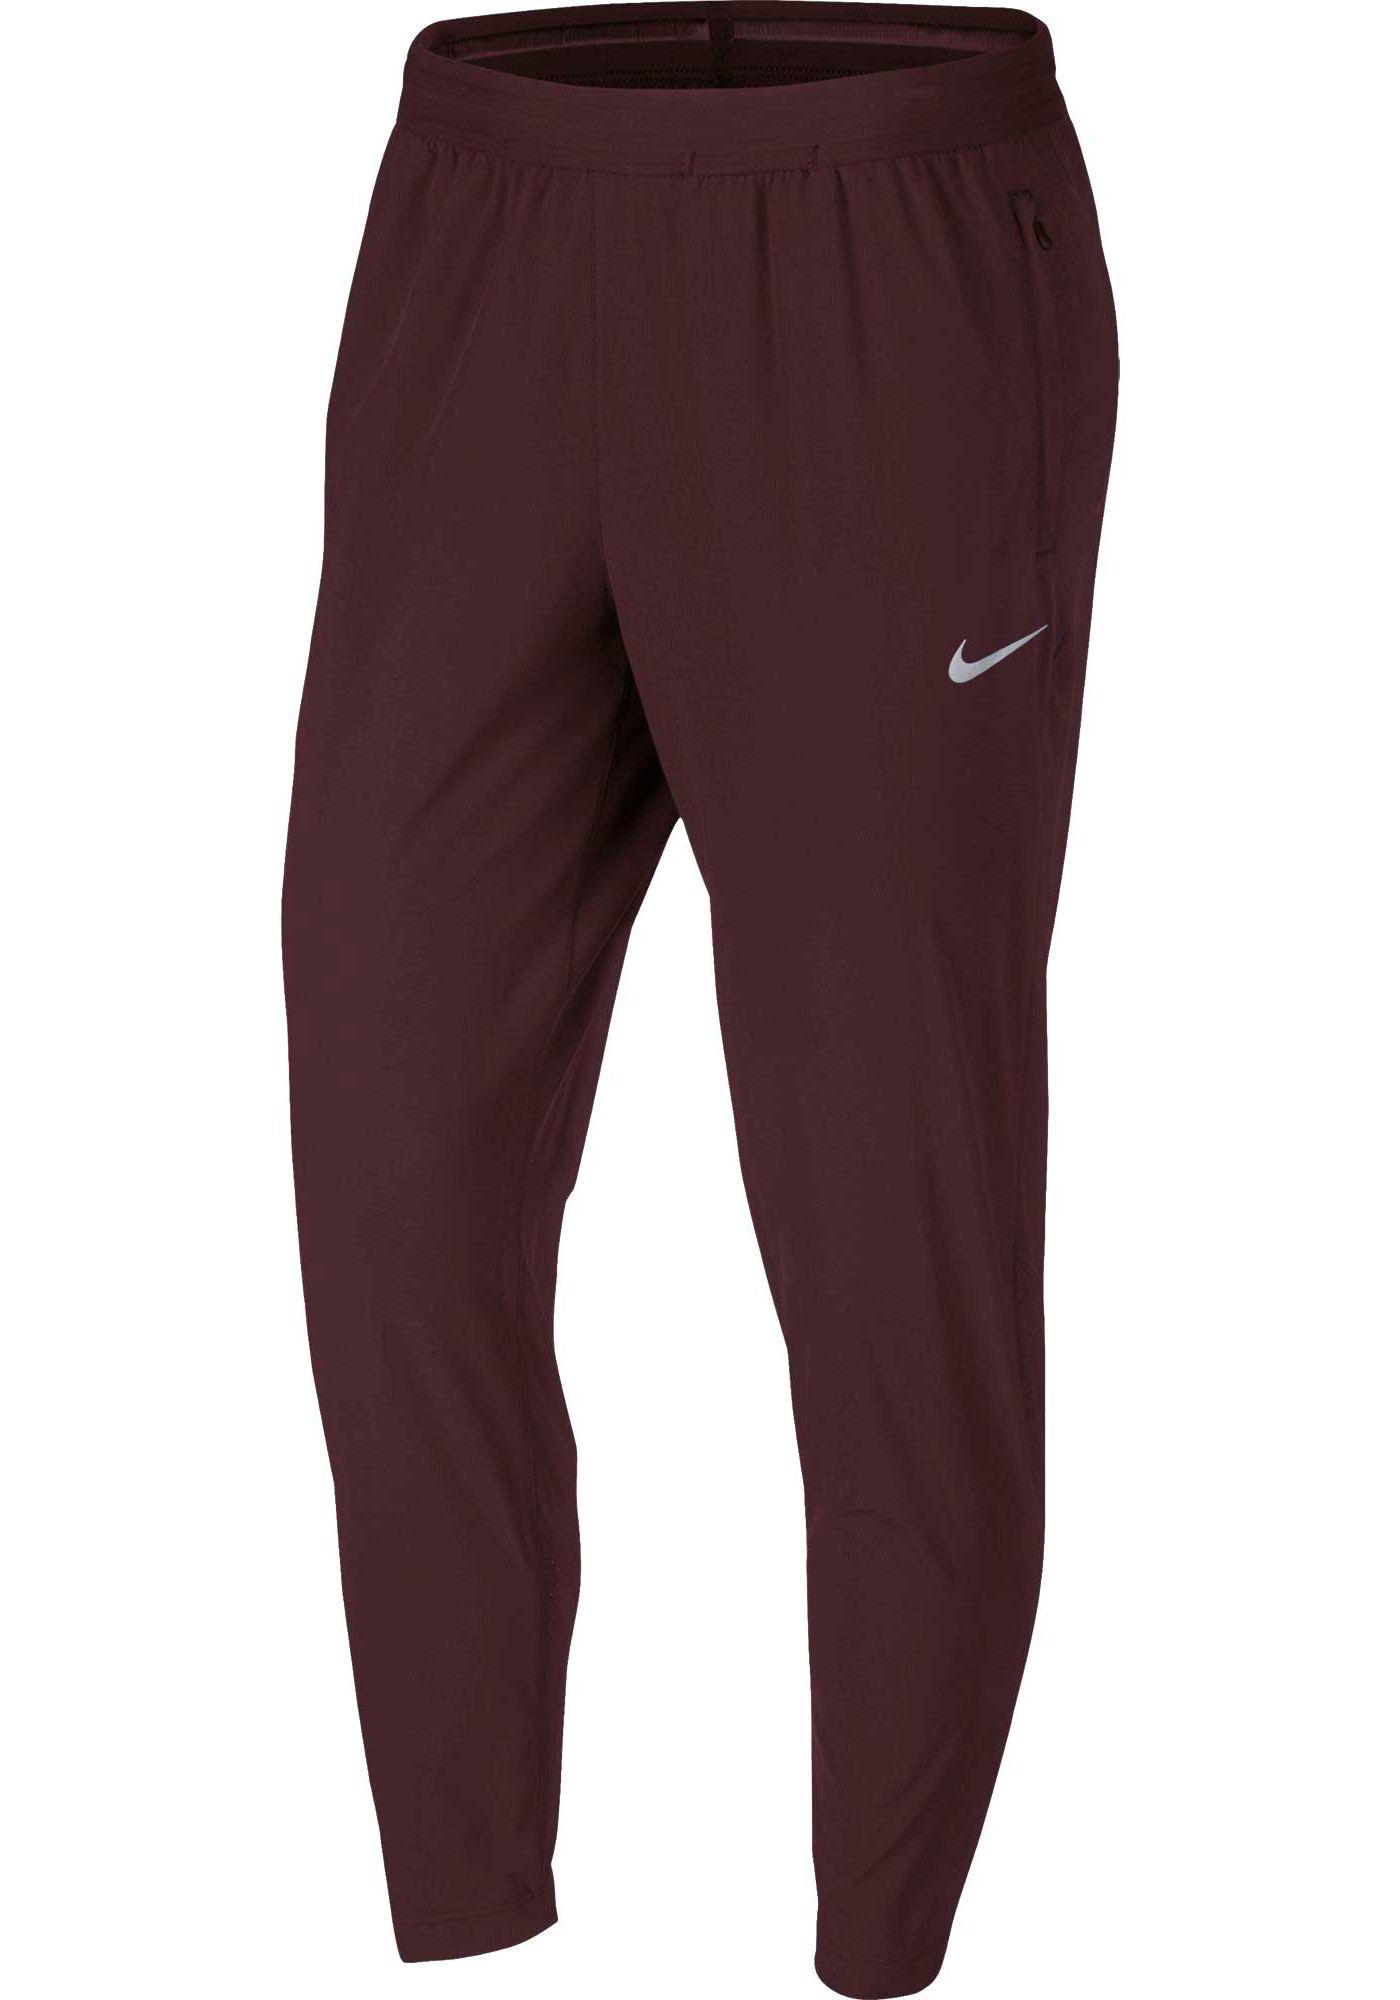 Nike Women's Essential 7/8 Running Pants